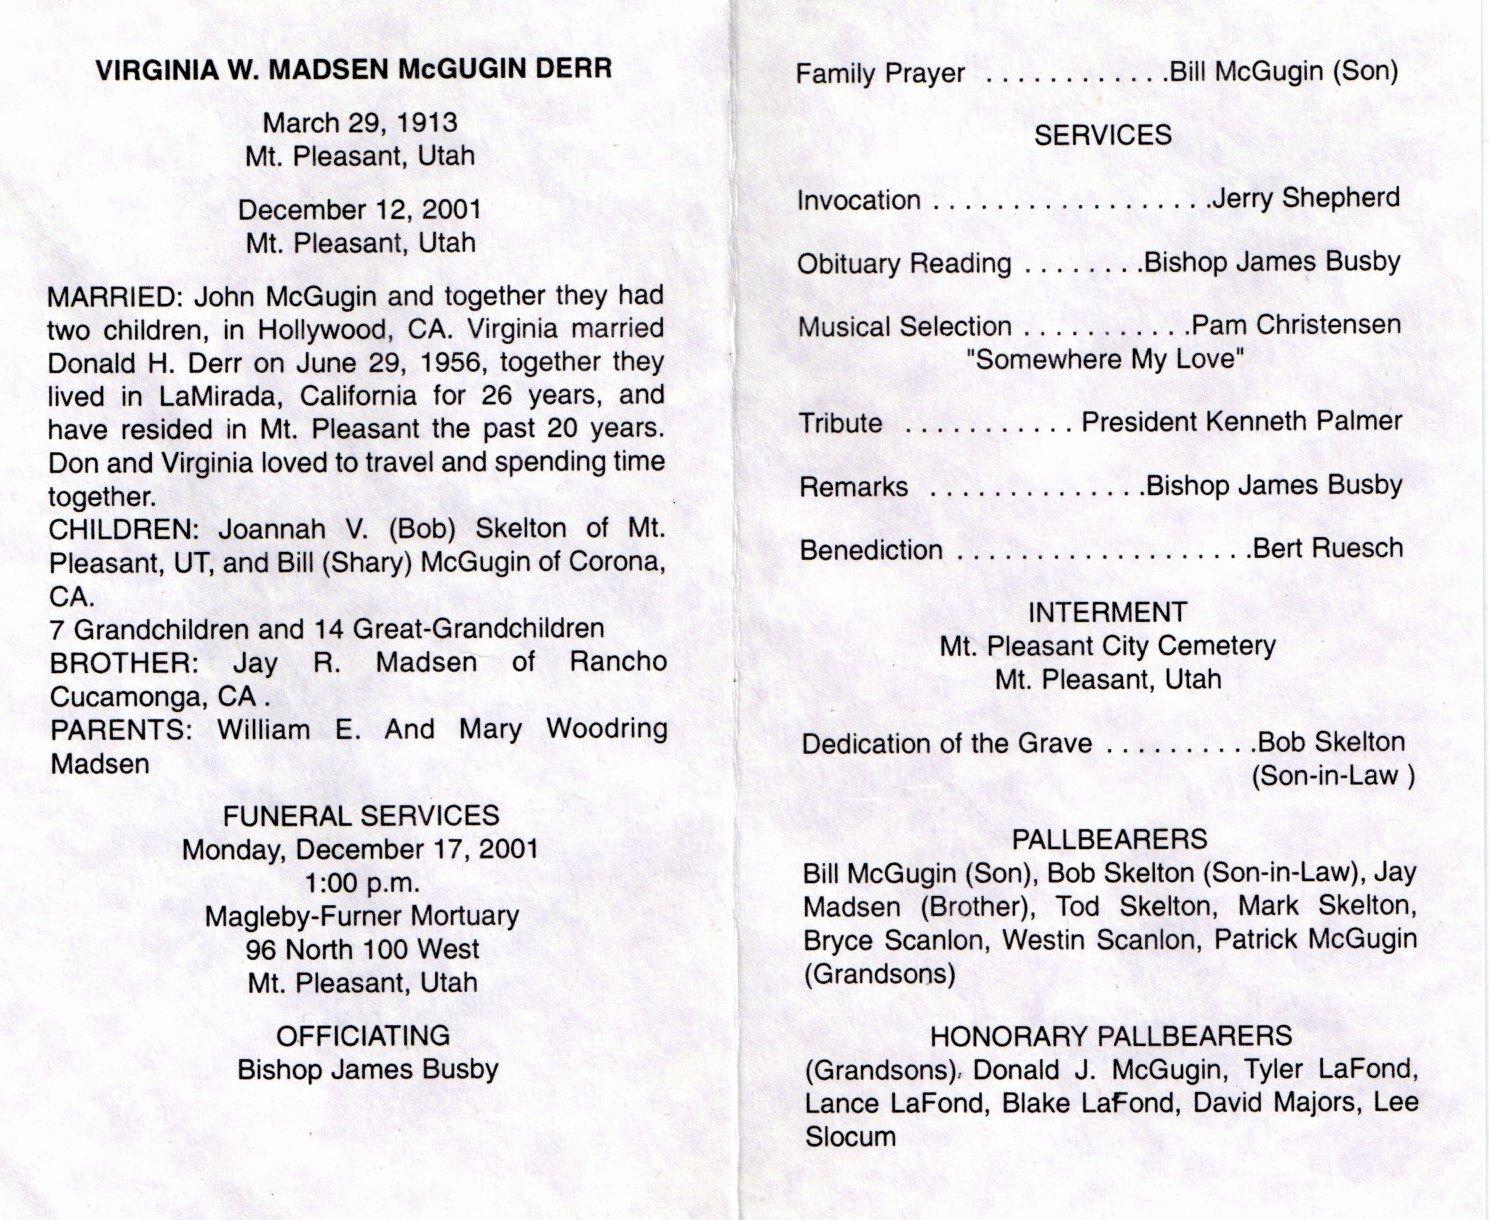 Mt Pleasant Obituary Page Virginia Madsen Mcgugin Derr